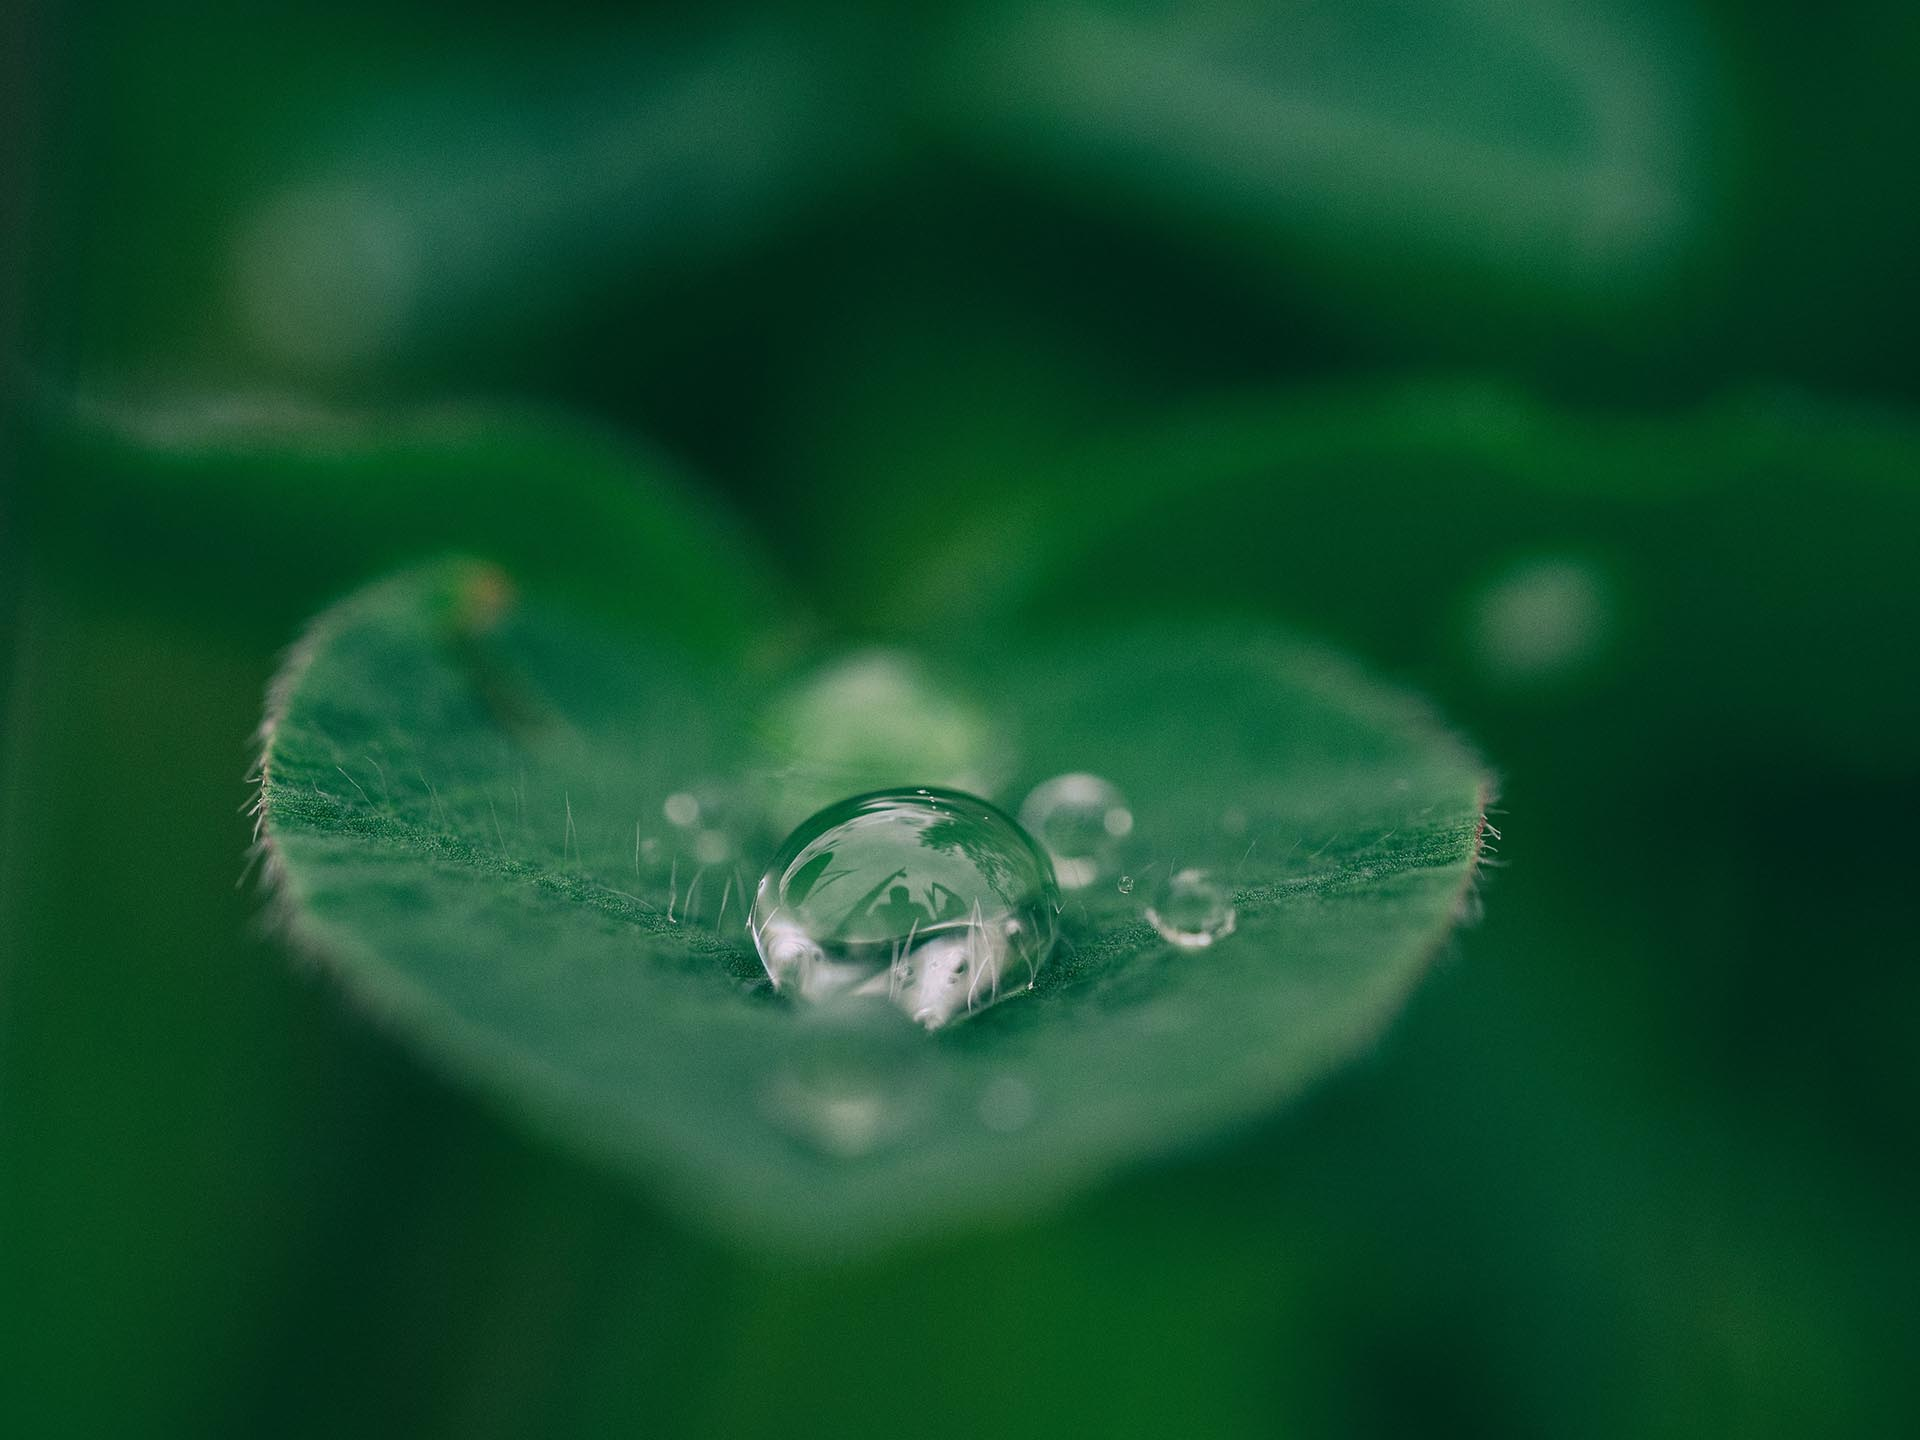 Close up a a rain drop on a green leaf